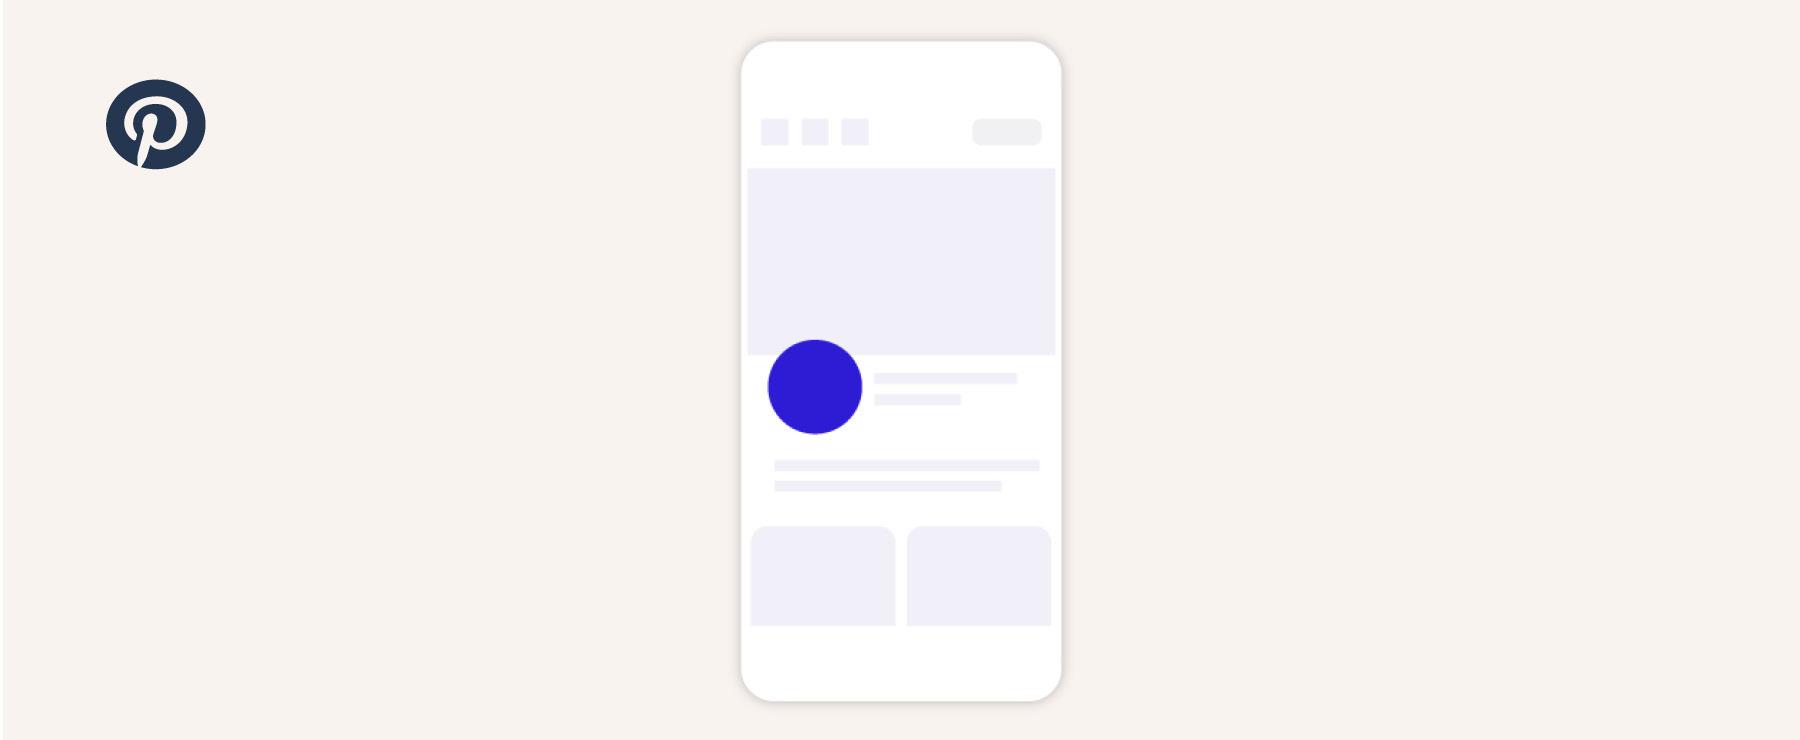 Pinterest profile picture size guide